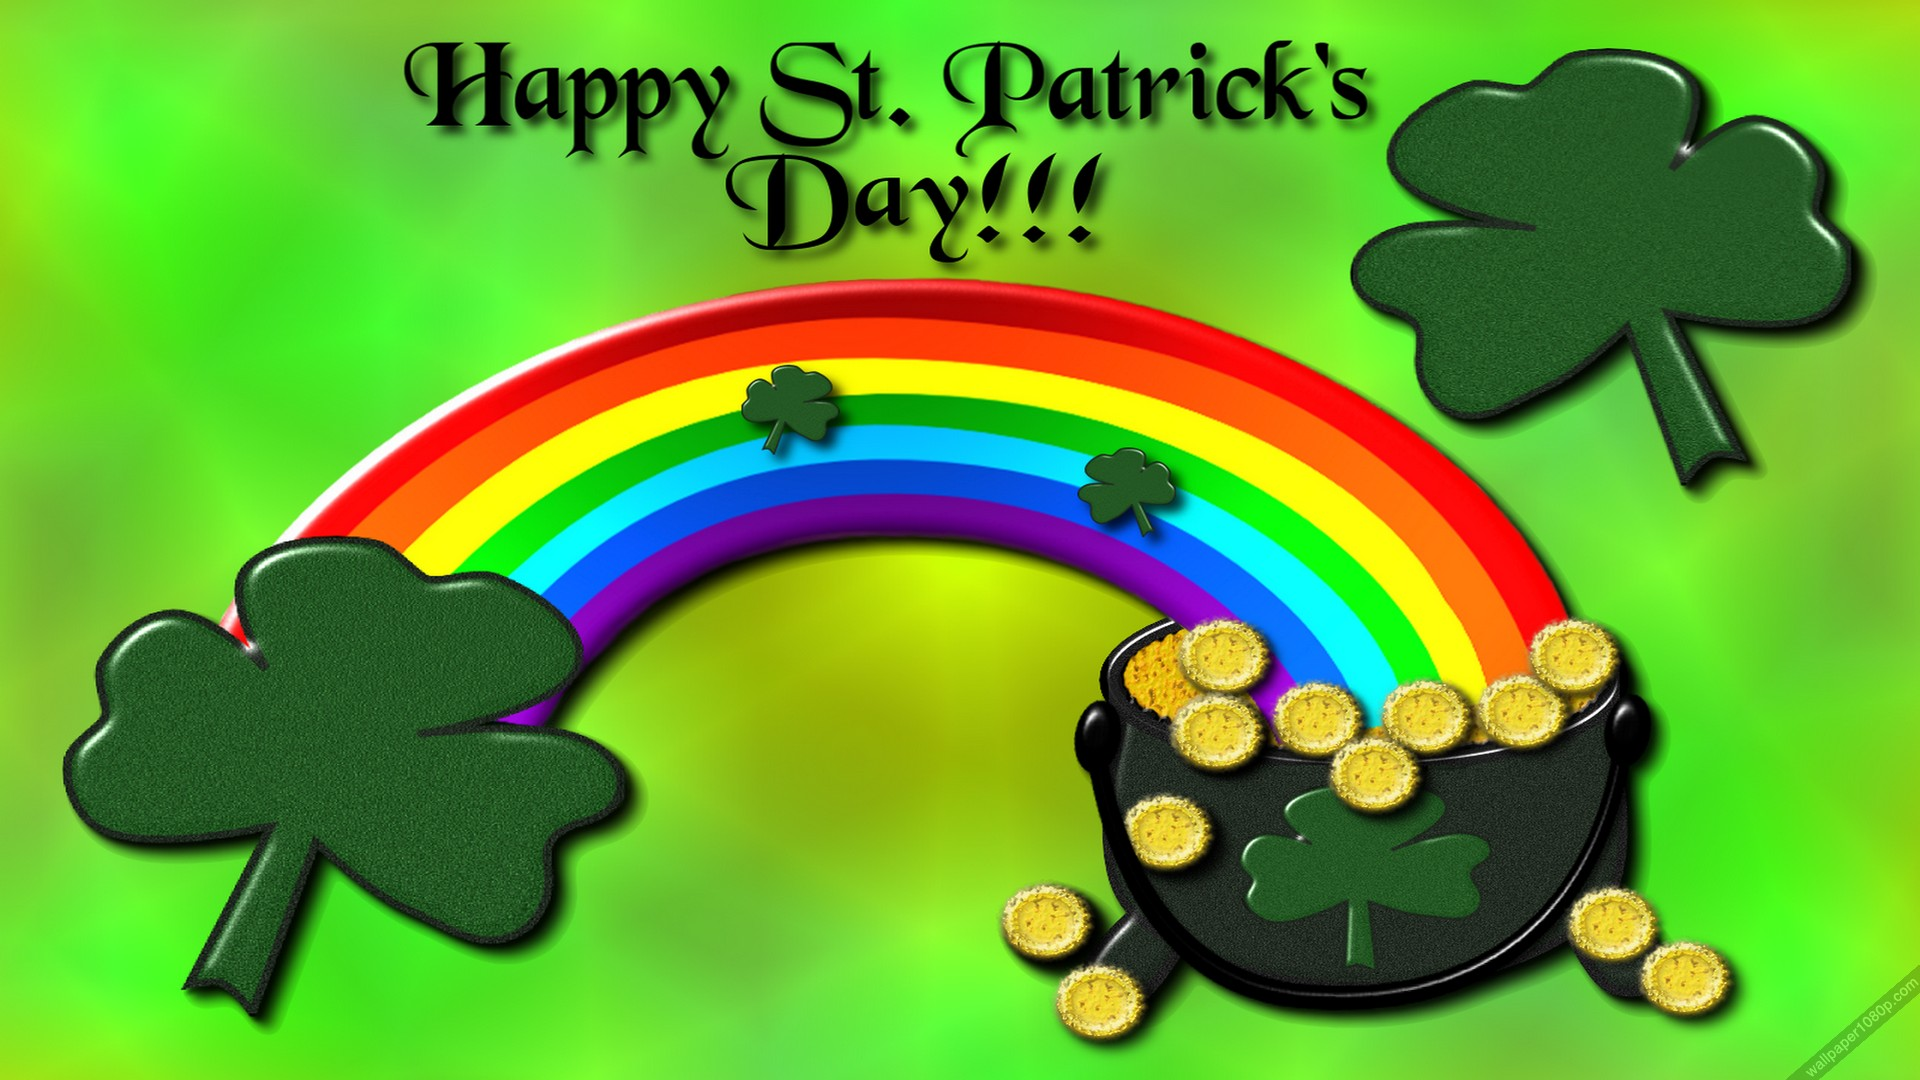 St Patricks Day Desktop Background wallpaper St Patricks Day 1920x1080